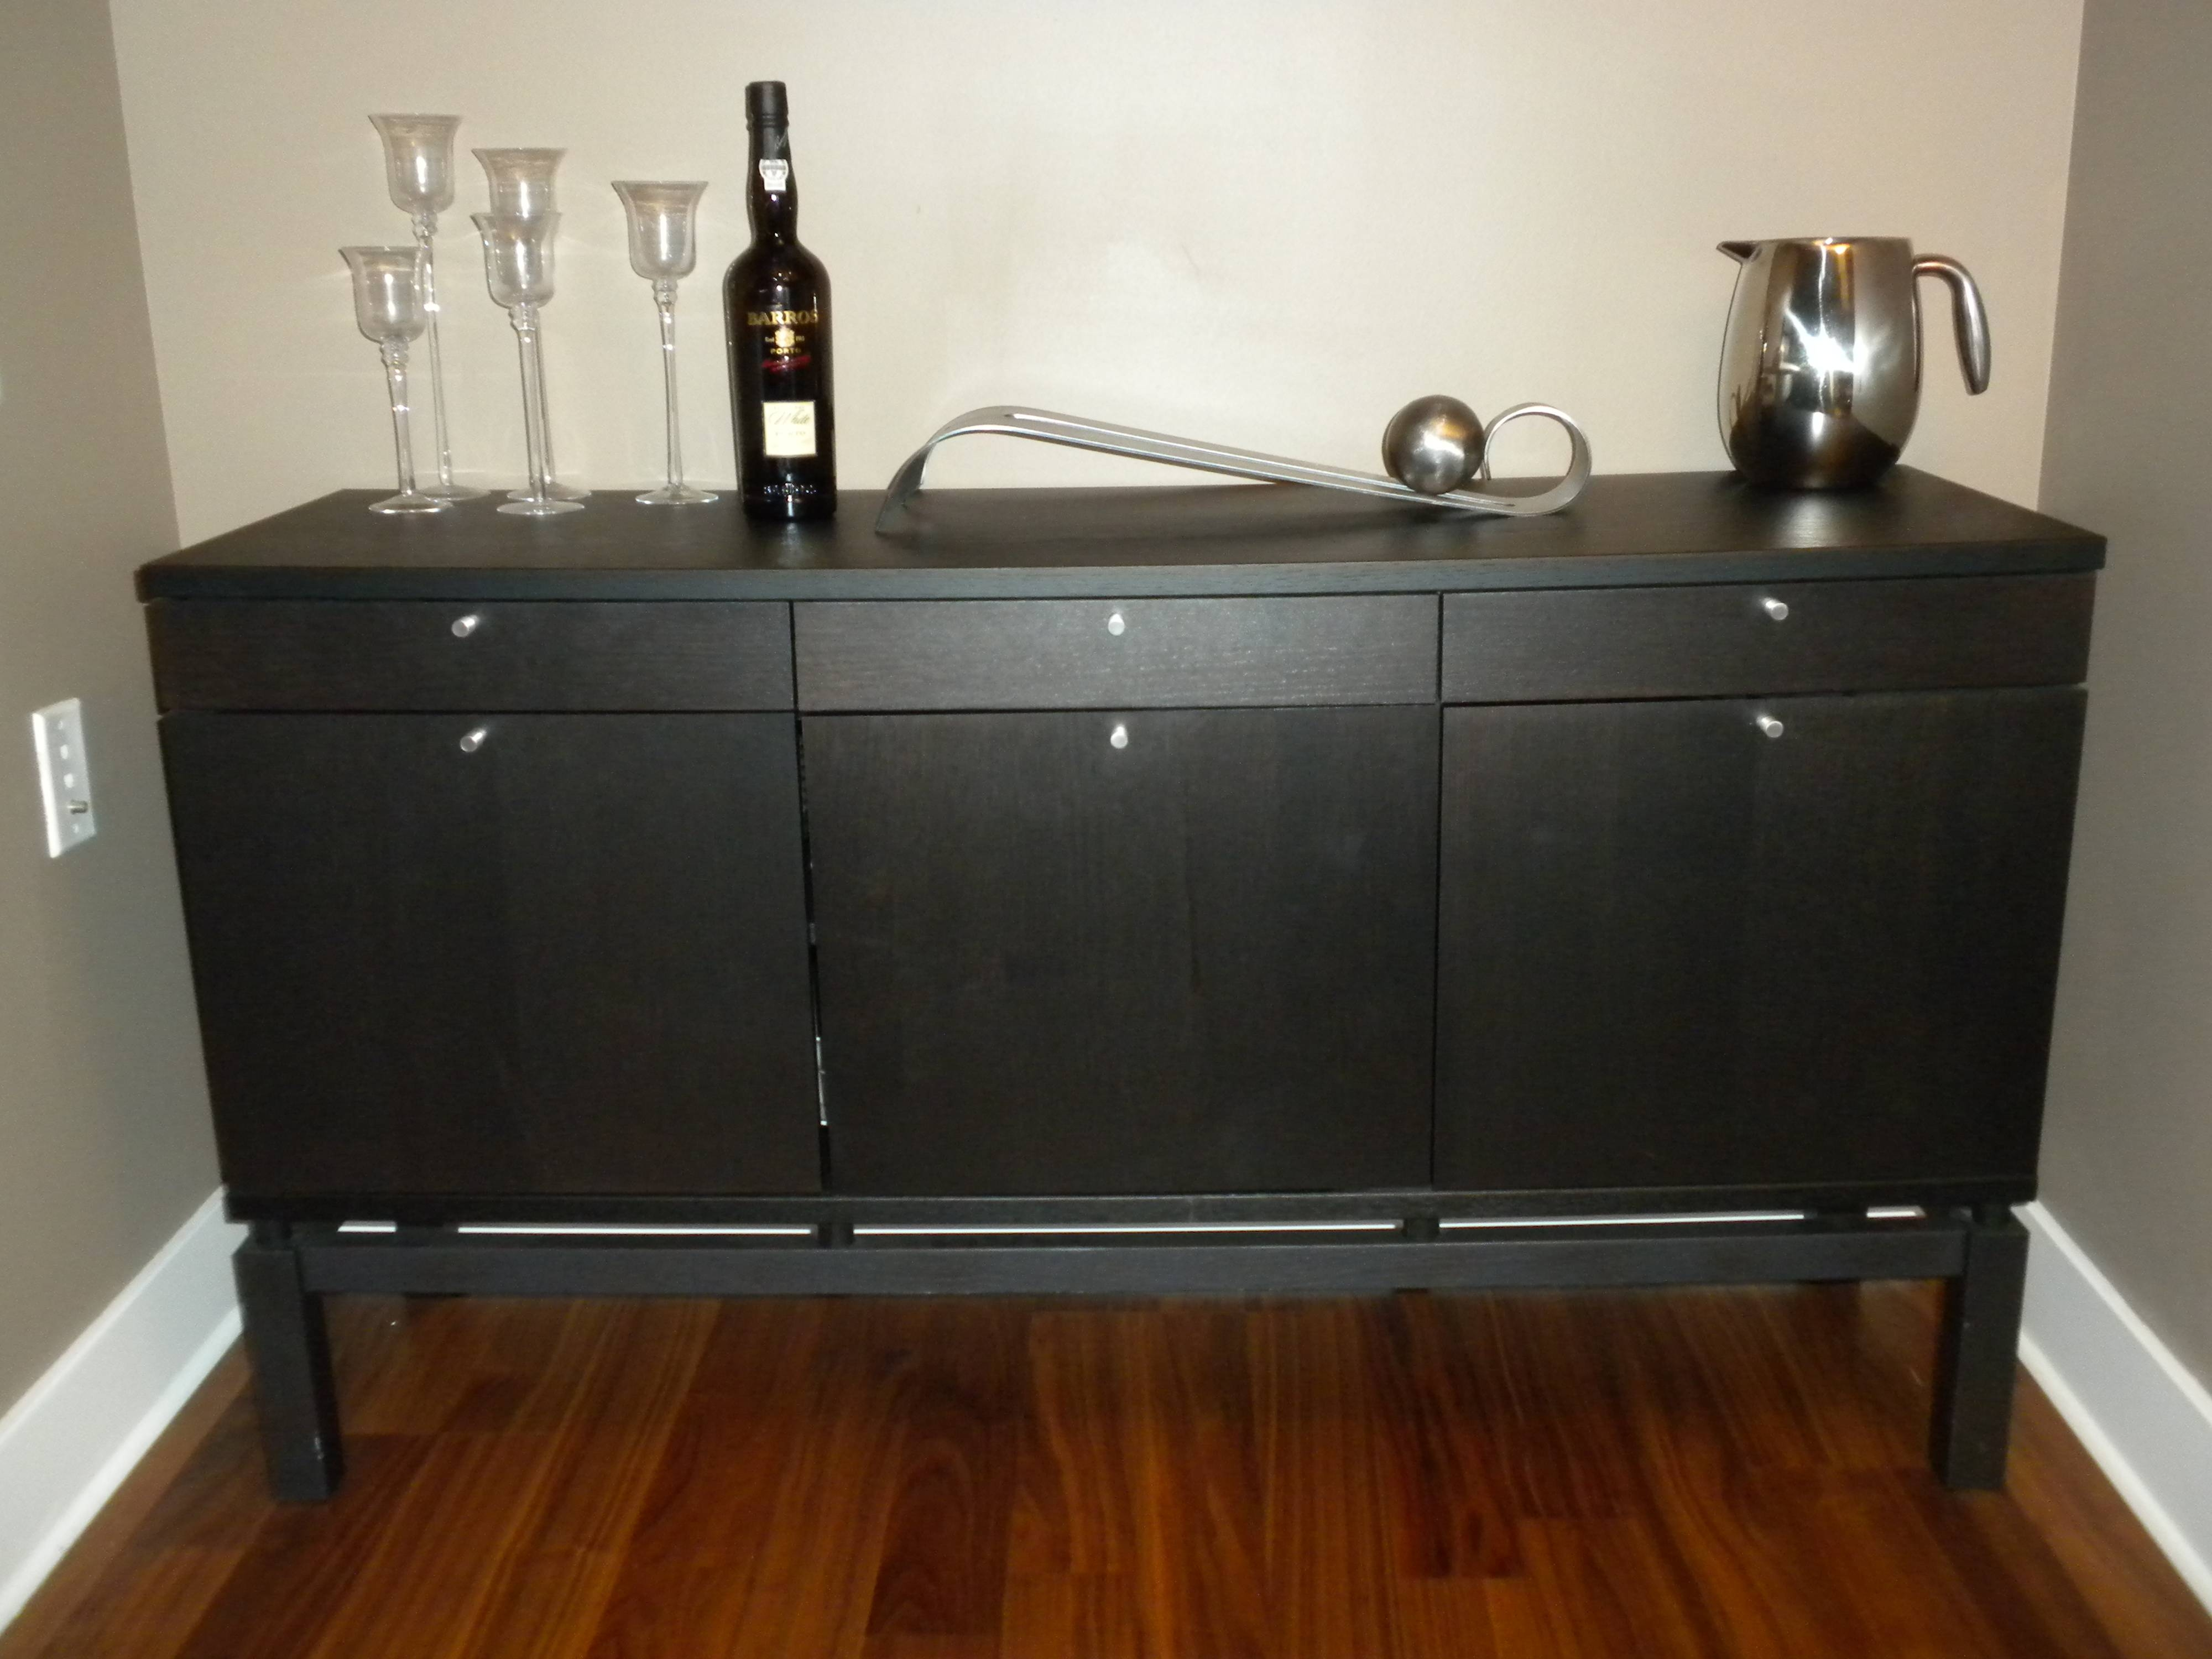 All Sizes | Ikea Bjursta Sideboard | Flickr - Photo Sharing! with Bjursta Sideboards (Image 1 of 15)